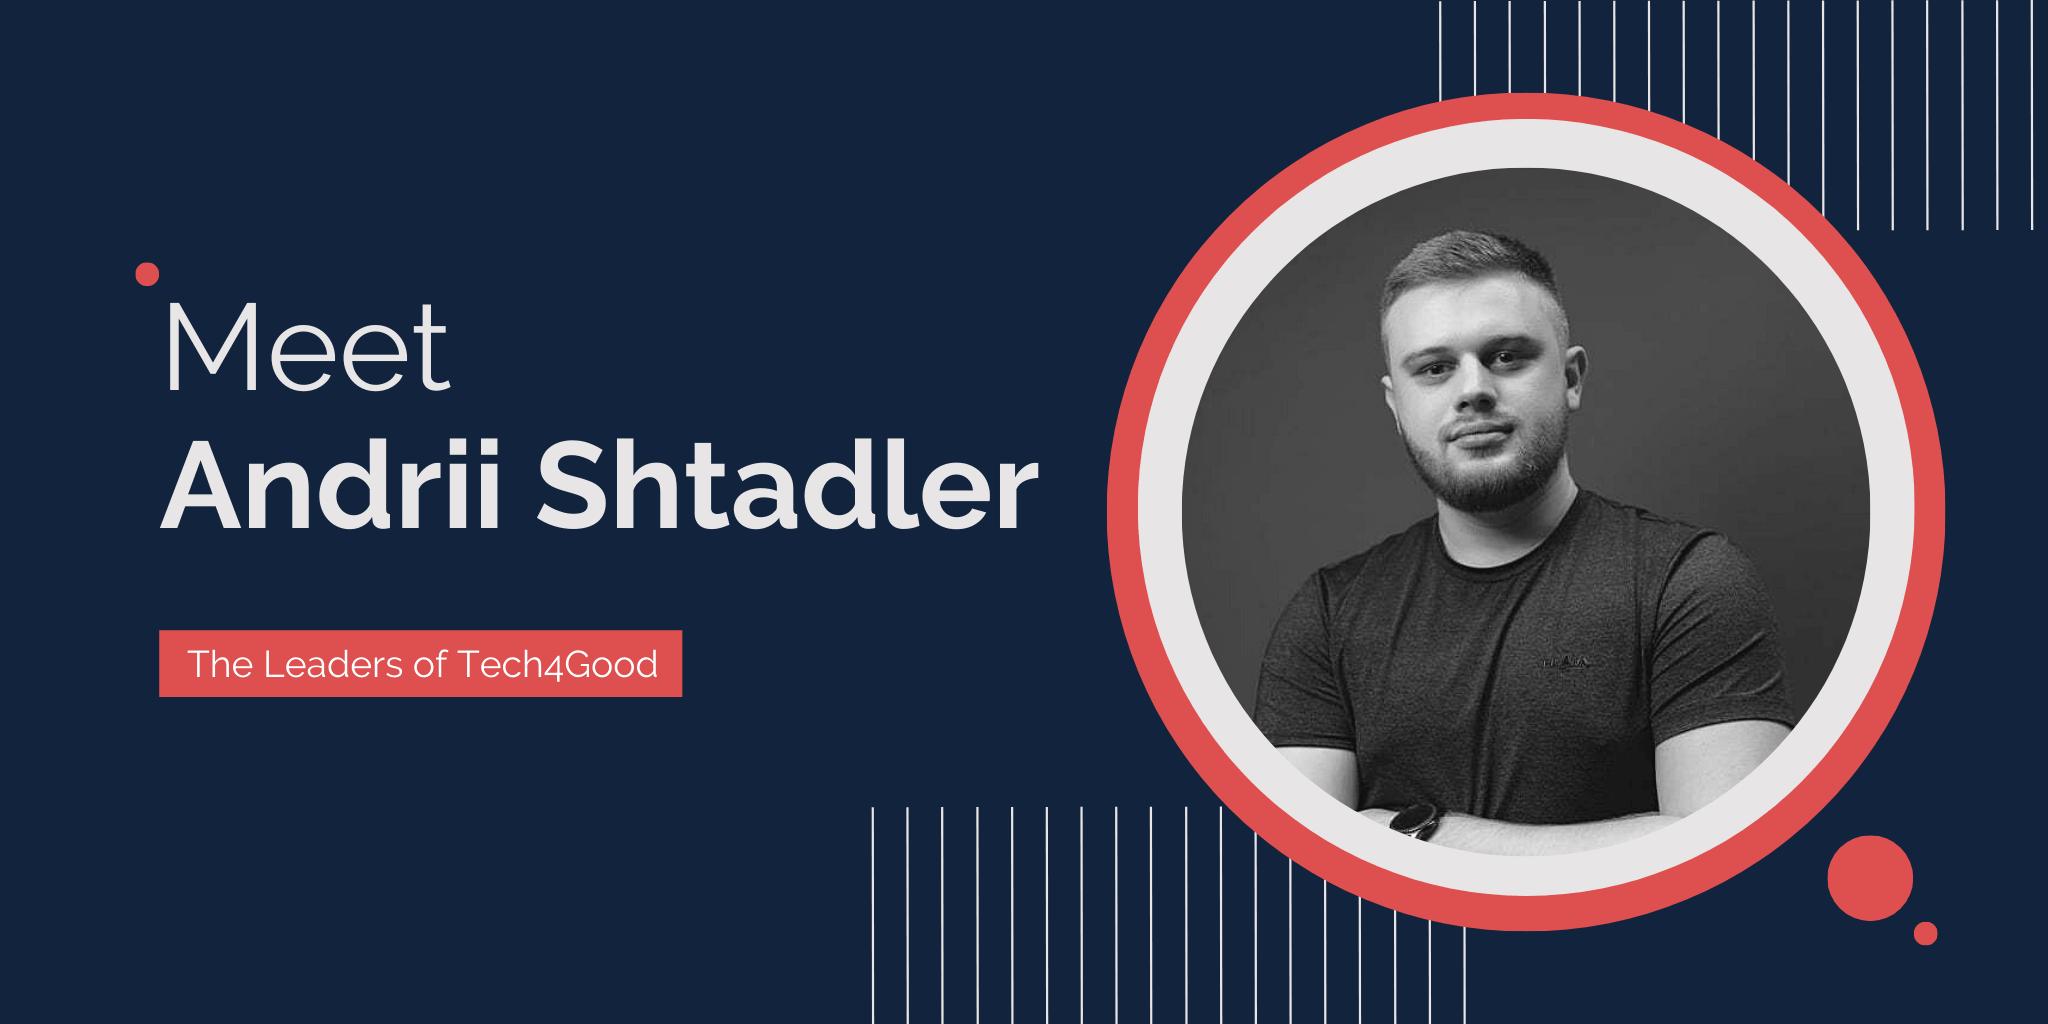 The Leaders of Tech4Good: Meet Andrii Shtadler